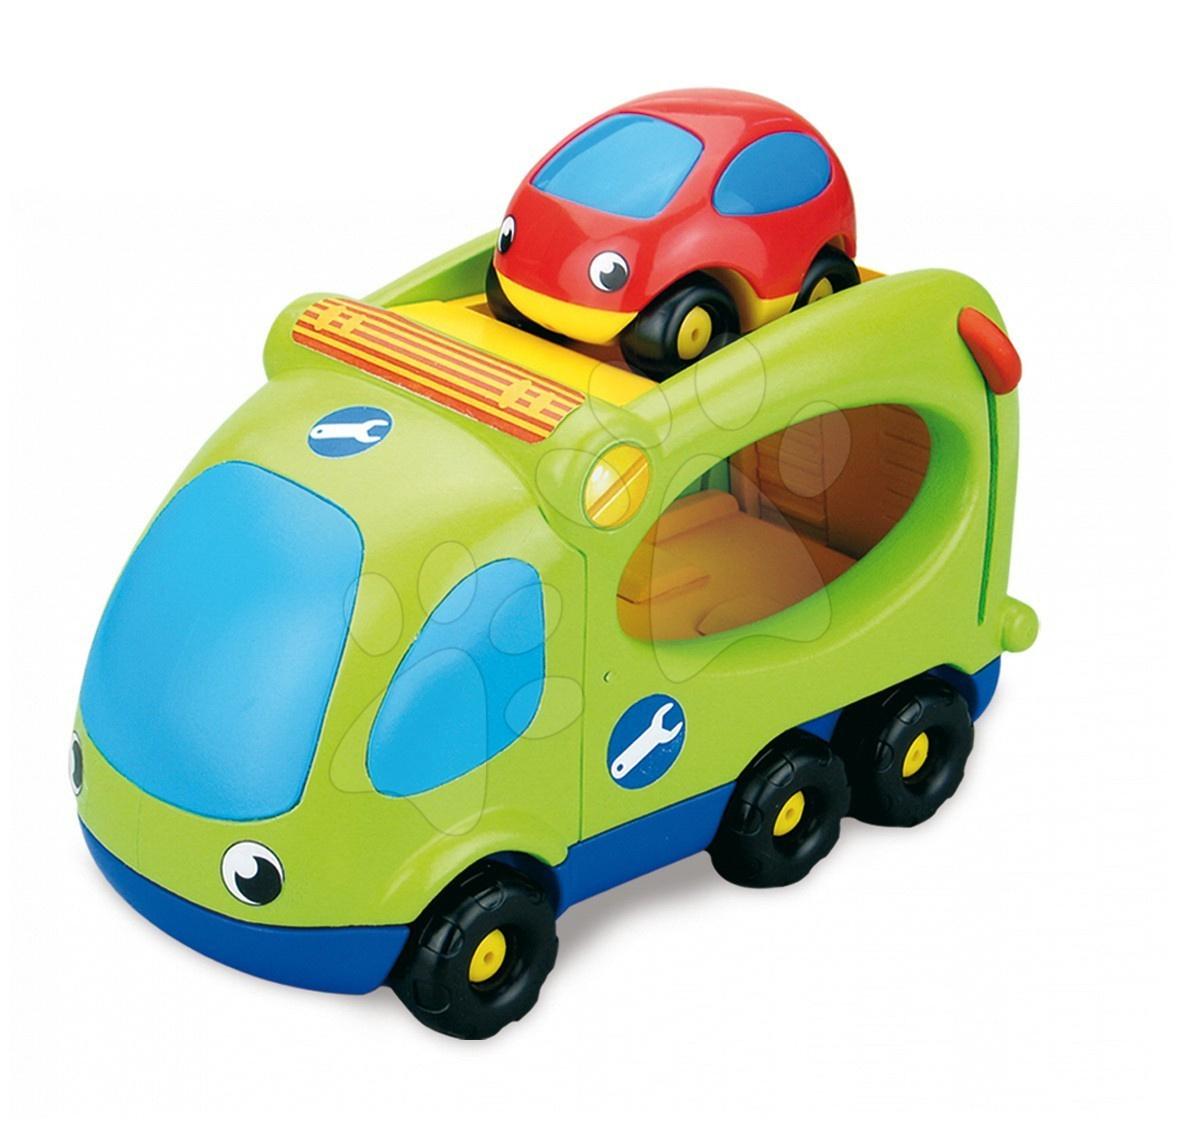 Smoby 211099 Vroom Planet camion transportér 21*12*13,5 cm od 12 mes